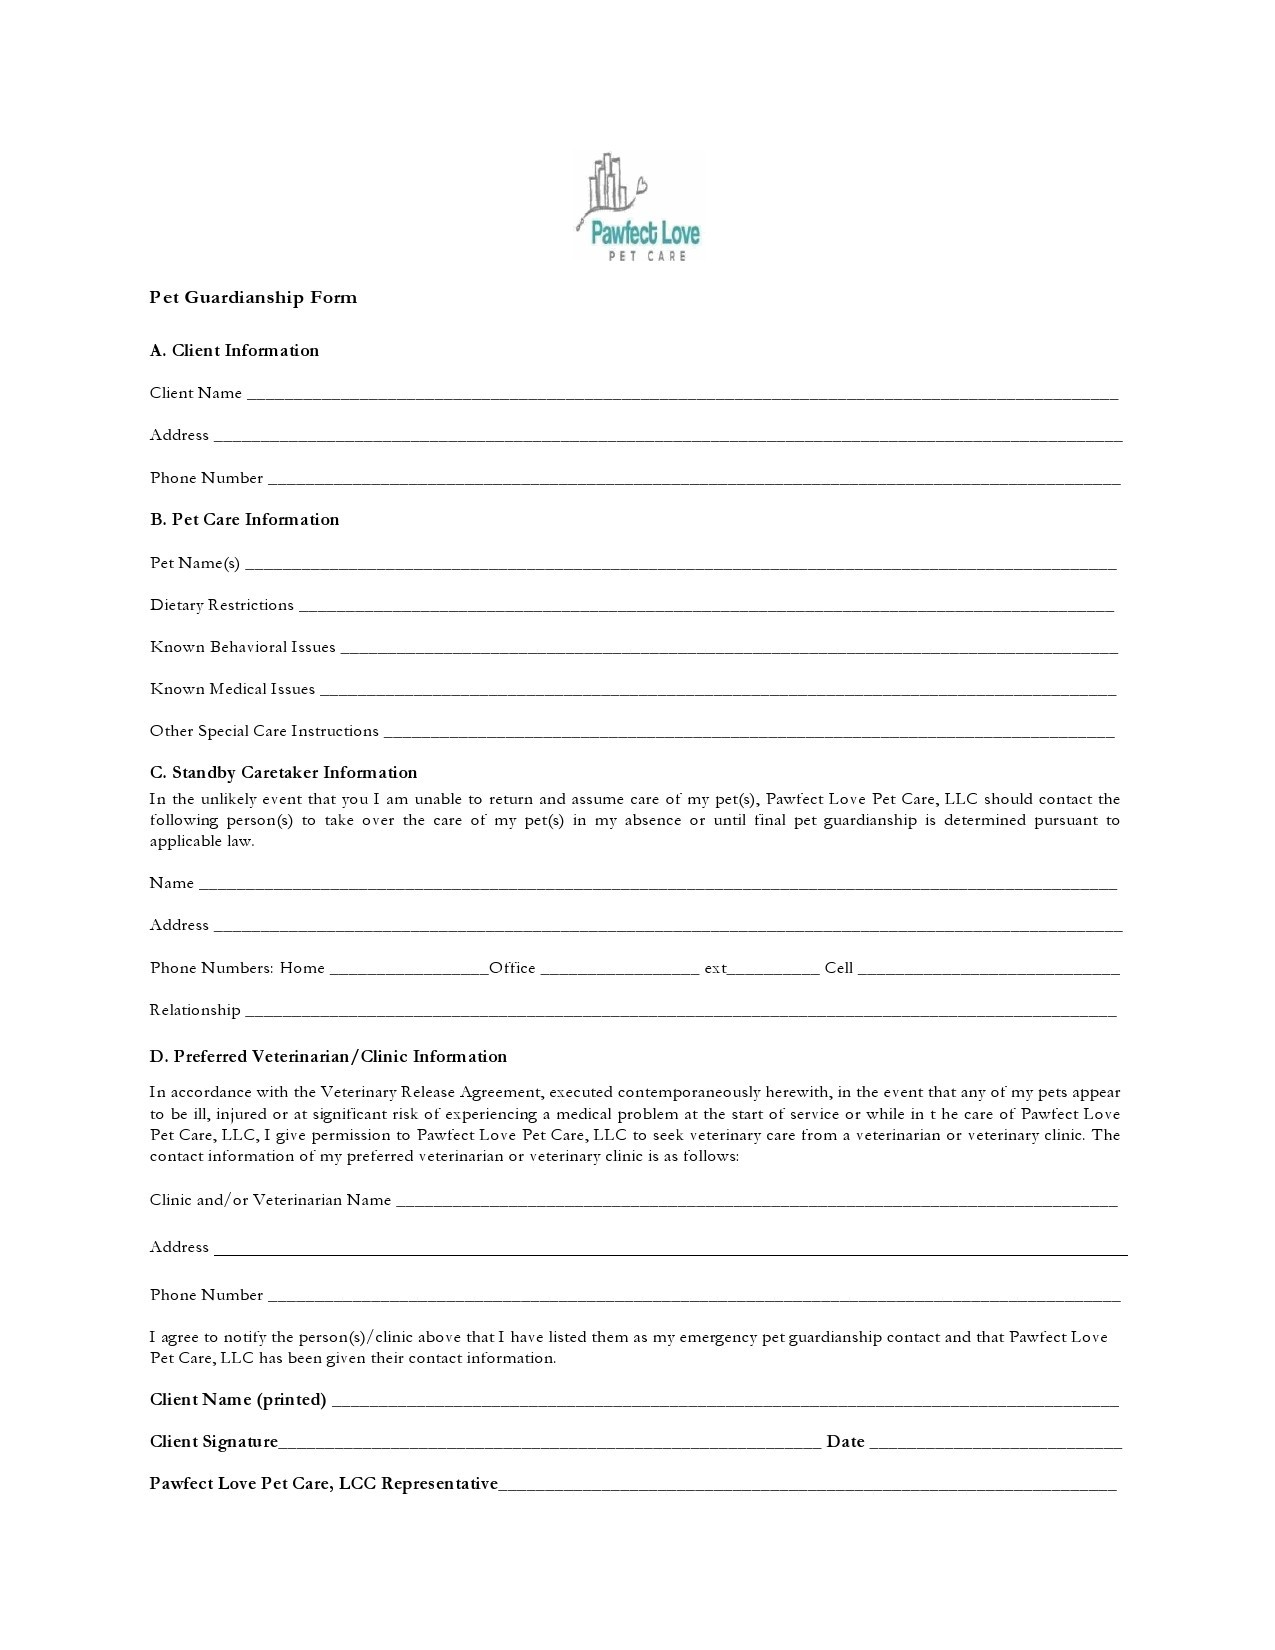 Free guardianship form 39